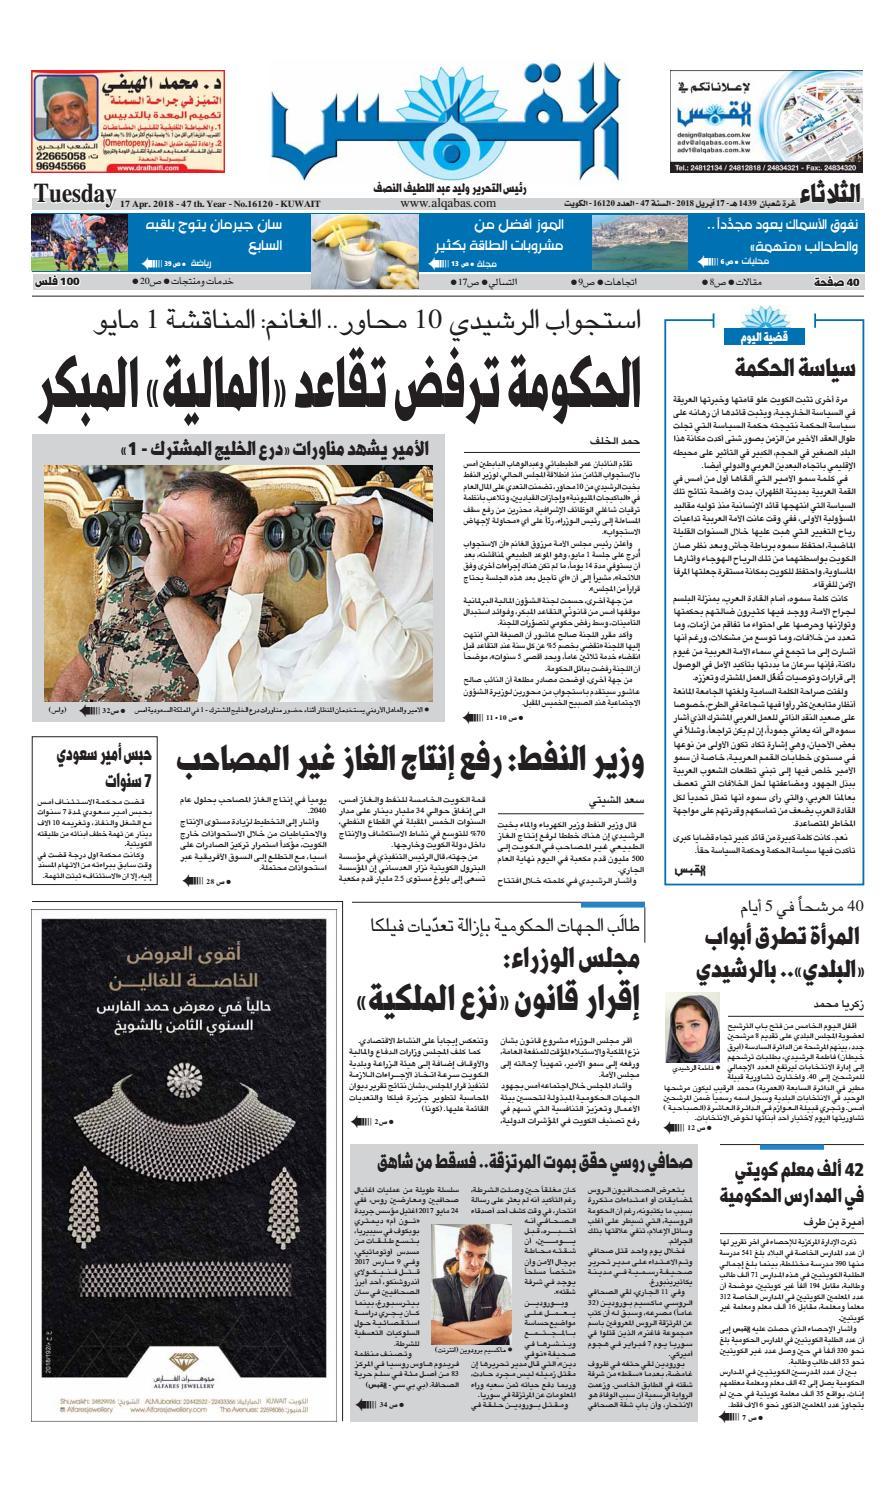 f4586bfe3 القبس عدد الثلاثاء 17 أبريل 2018 by AlQabas - issuu